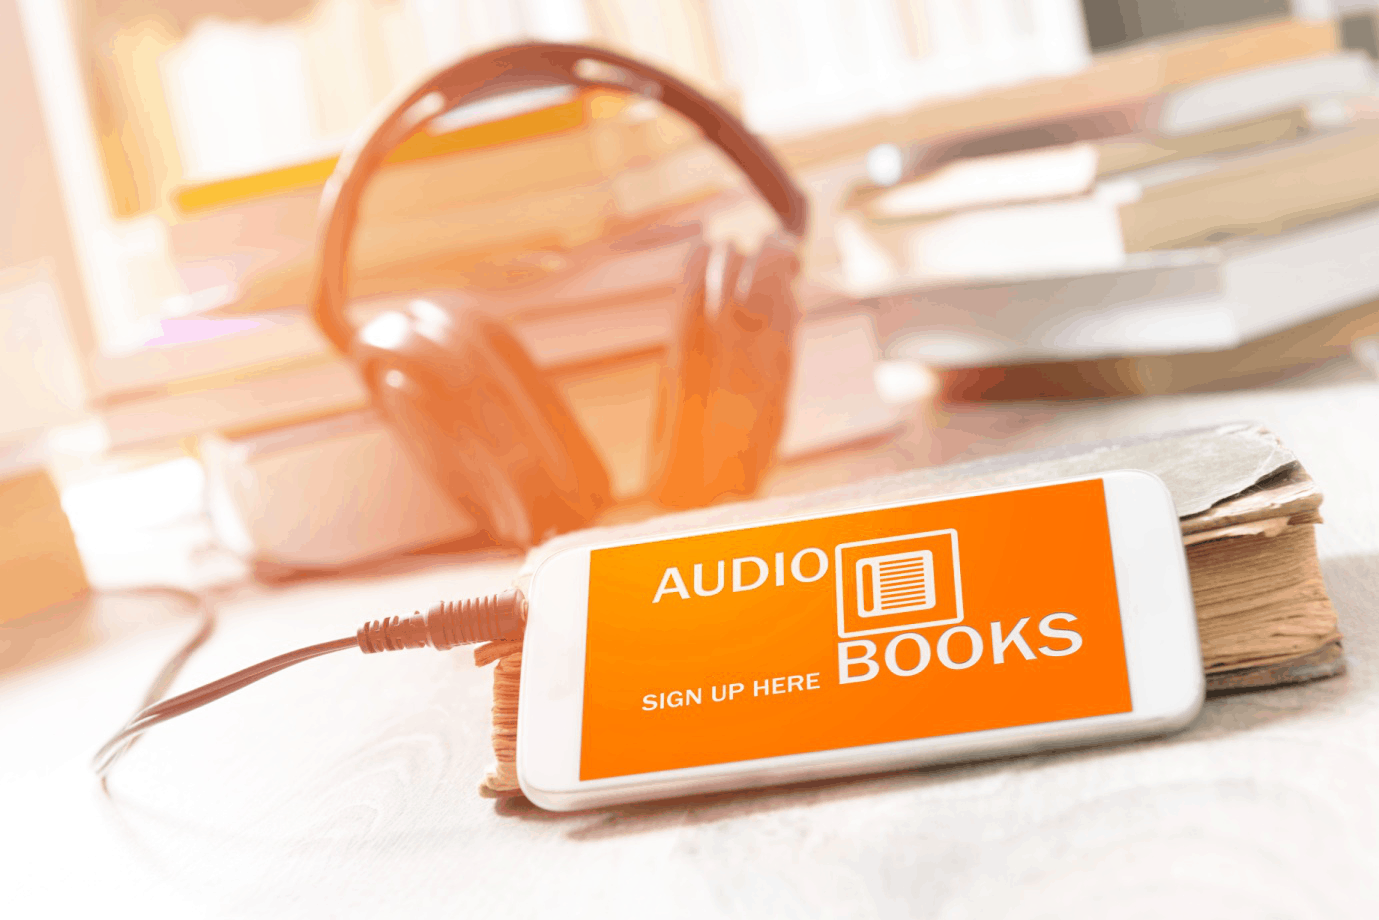 Best Ways to Listen to Audiobooks on iPhone